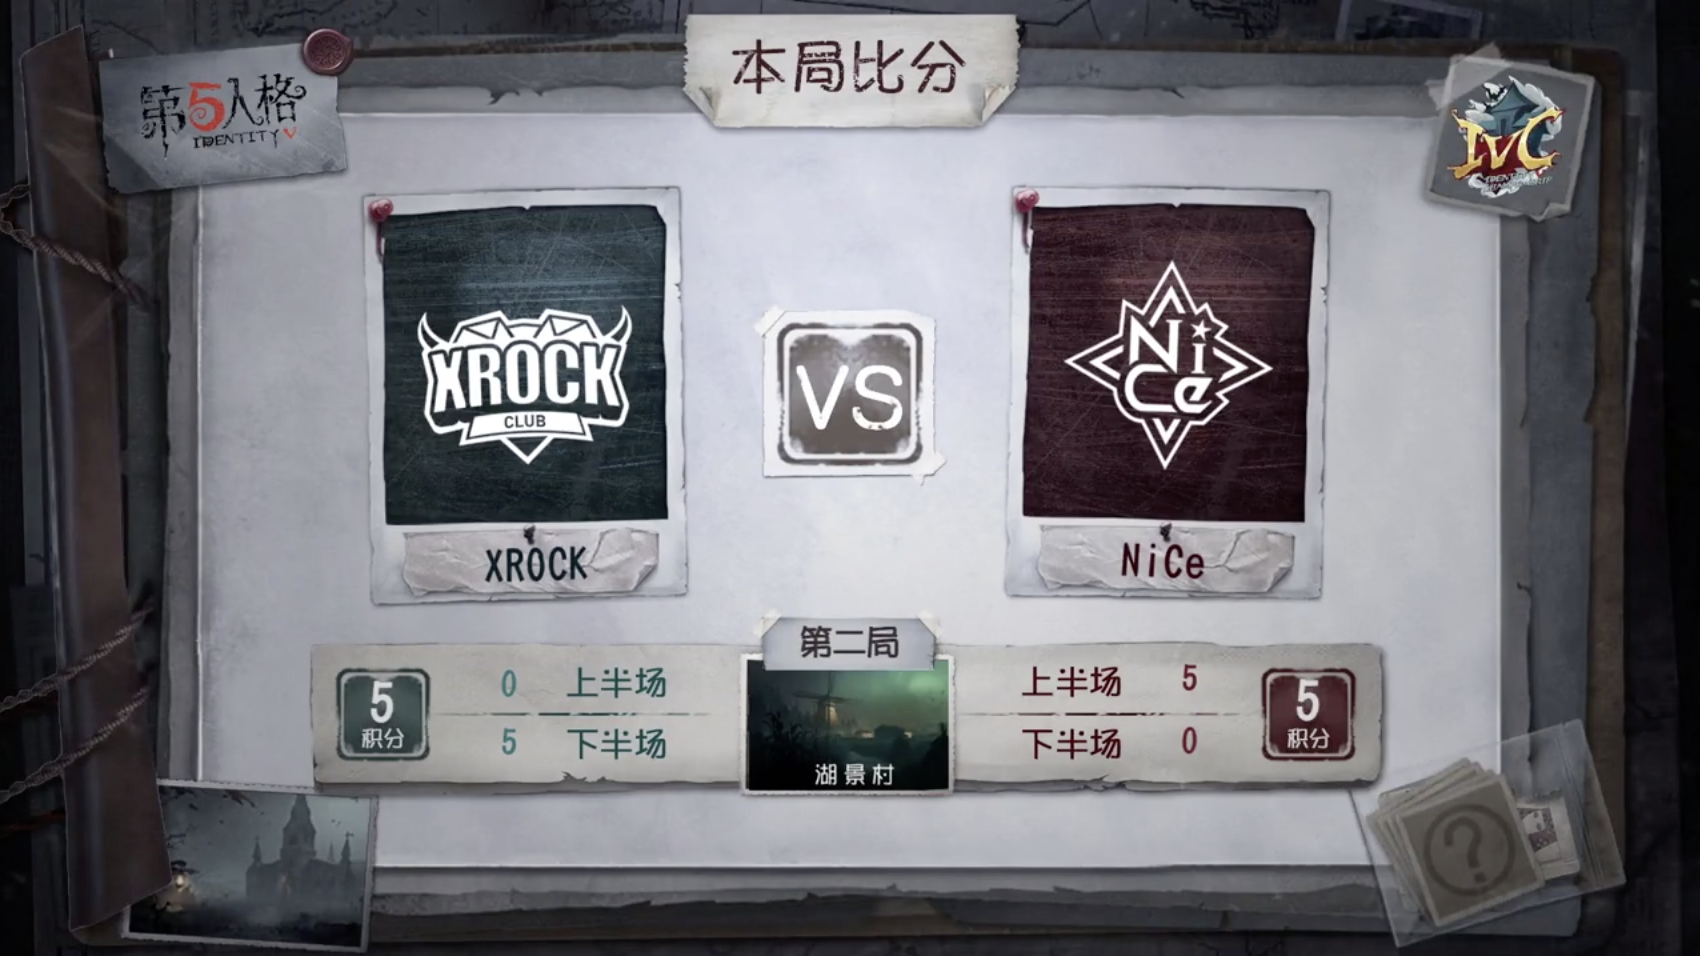 10月20日 XROCK vs NiCe小组赛BO3第二局